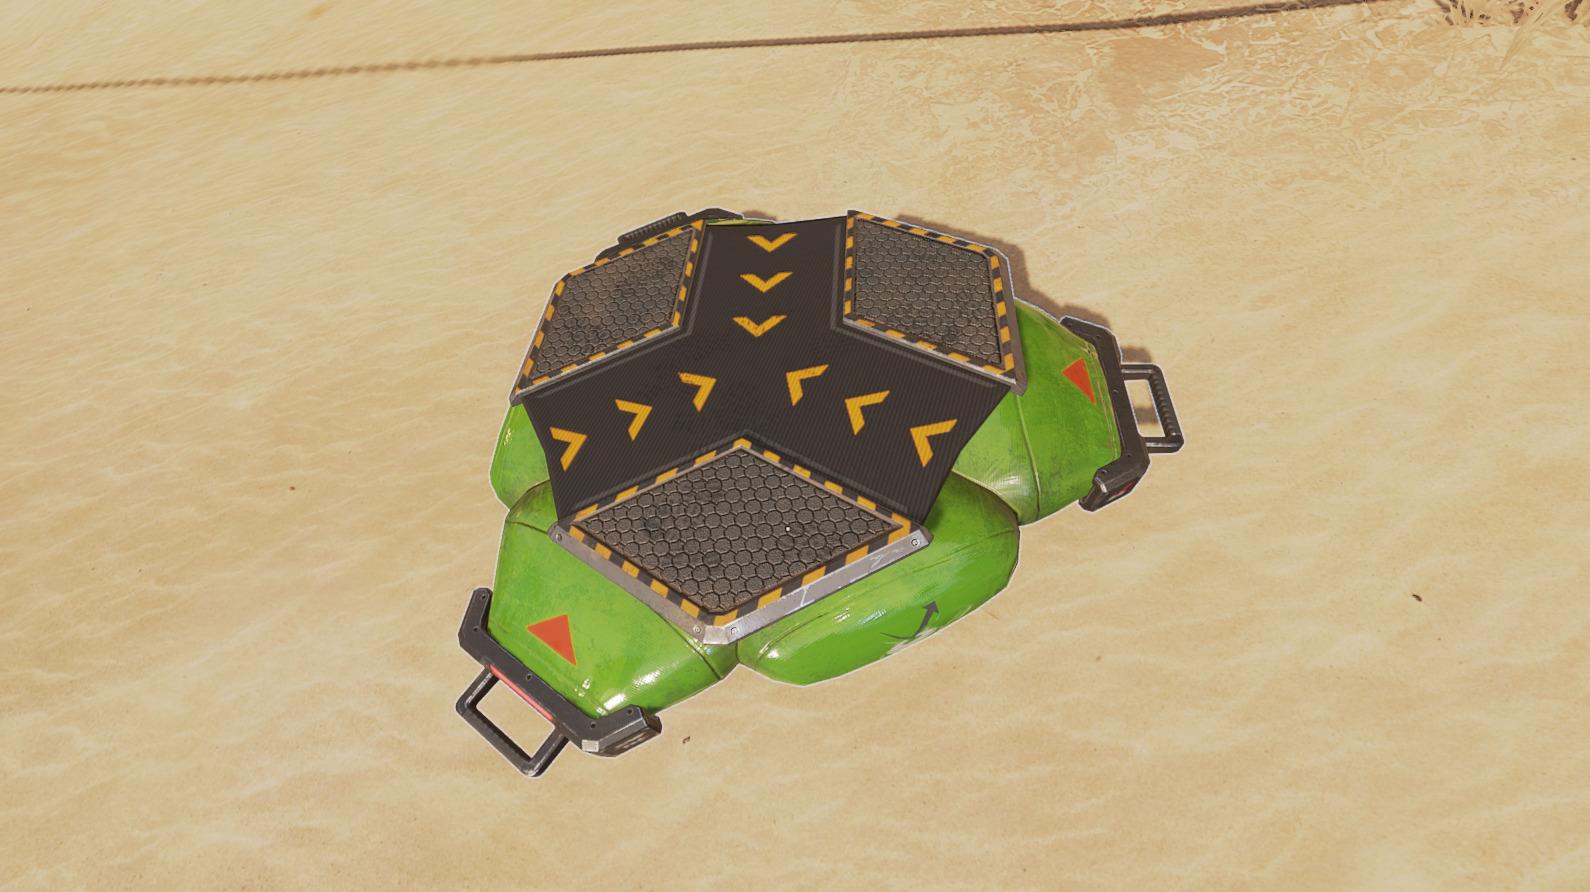 【Apex Legends】オクタンのジャンプパッドで垂直ジャンプ(真上に飛ぶ)する方法【エーペックスレジェンズ】